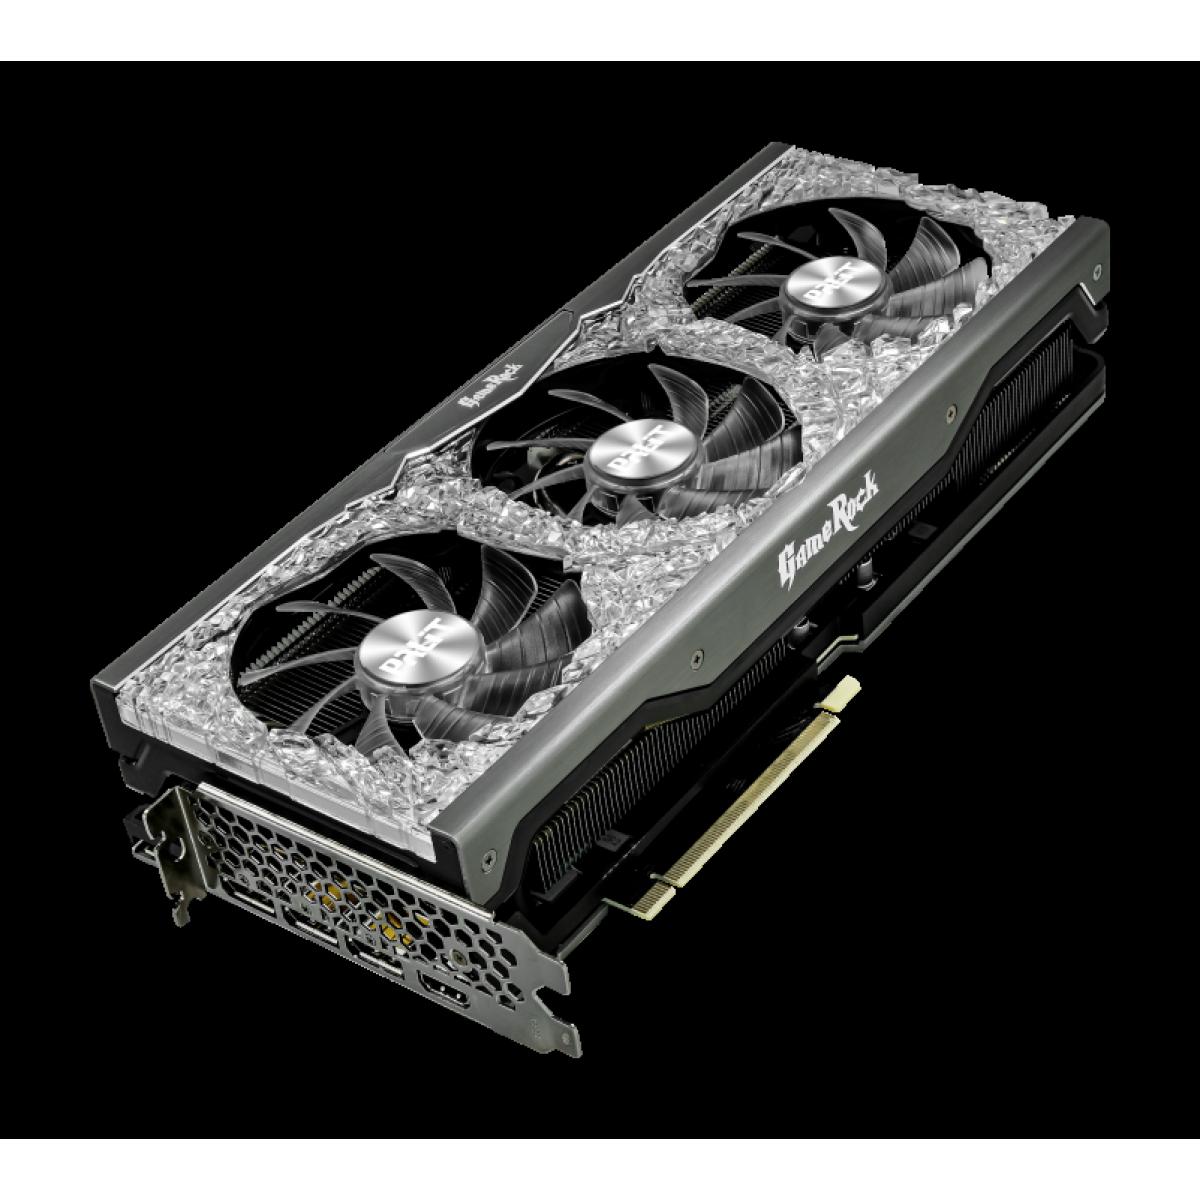 Placa de Vídeo Palit NVIDIA GeForce RTX 3080 GameRock OC, 10GB, GDDR6X, 320bit, NED3080H19IA-1020G